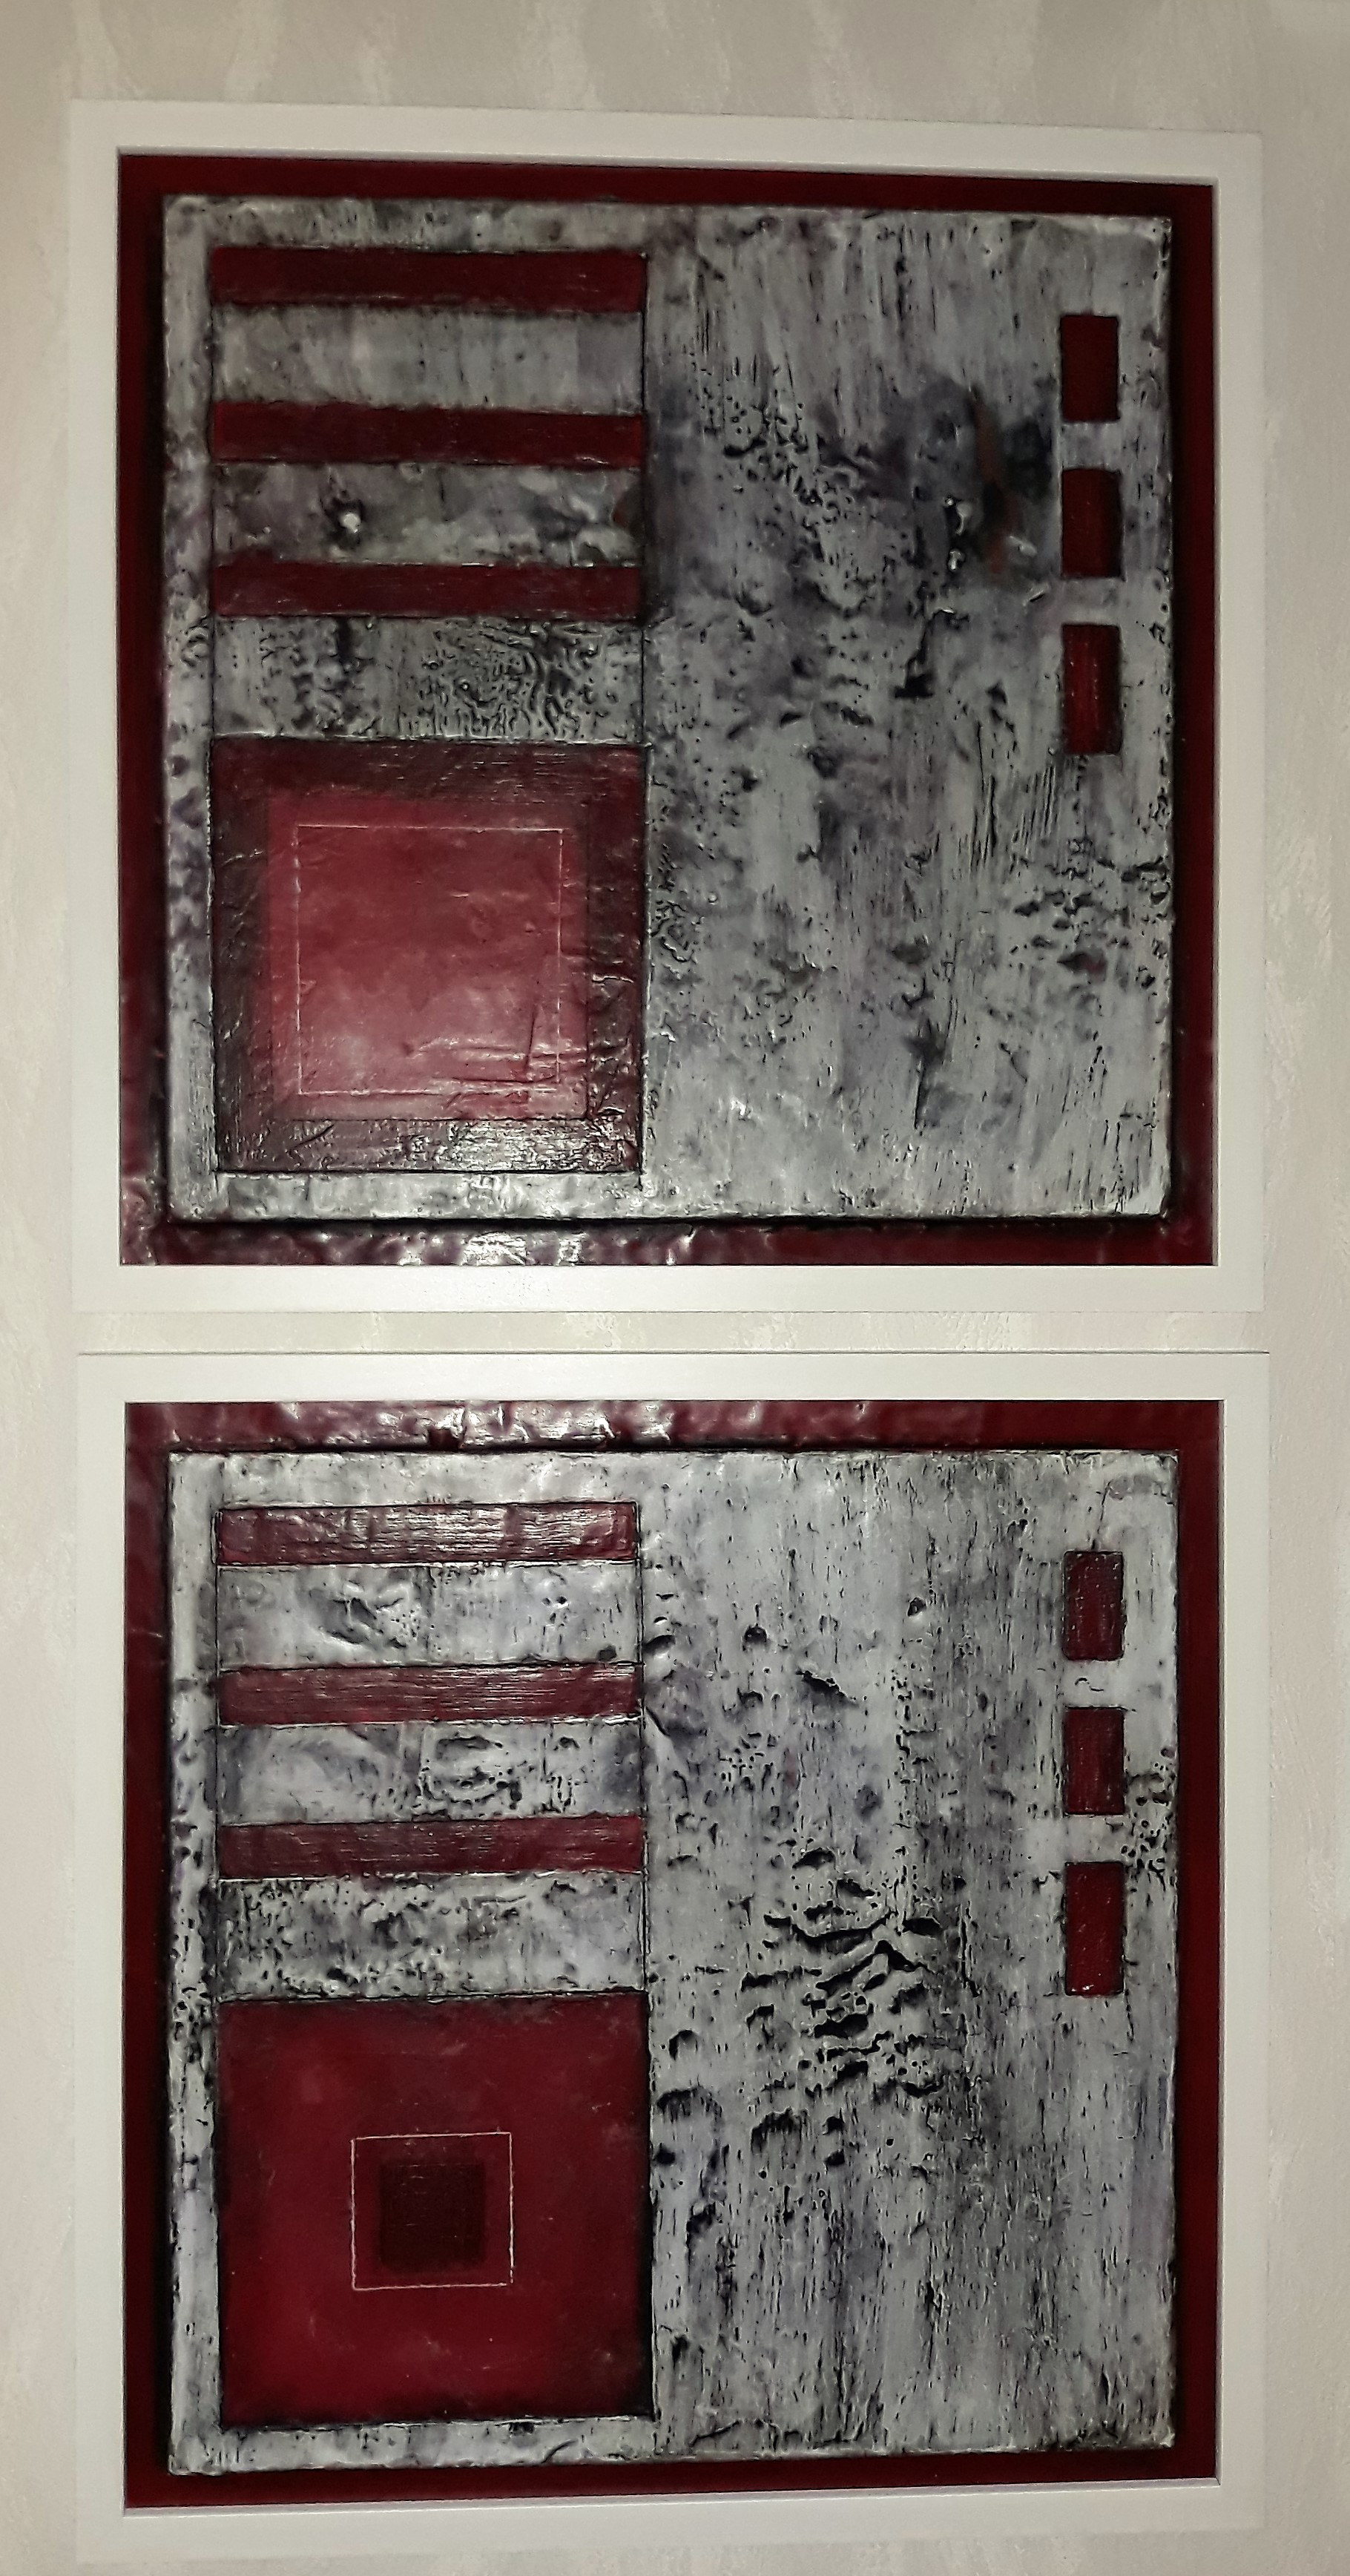 4ecke in rot im weißen Rahmen auf Holz je 40cmx40cm